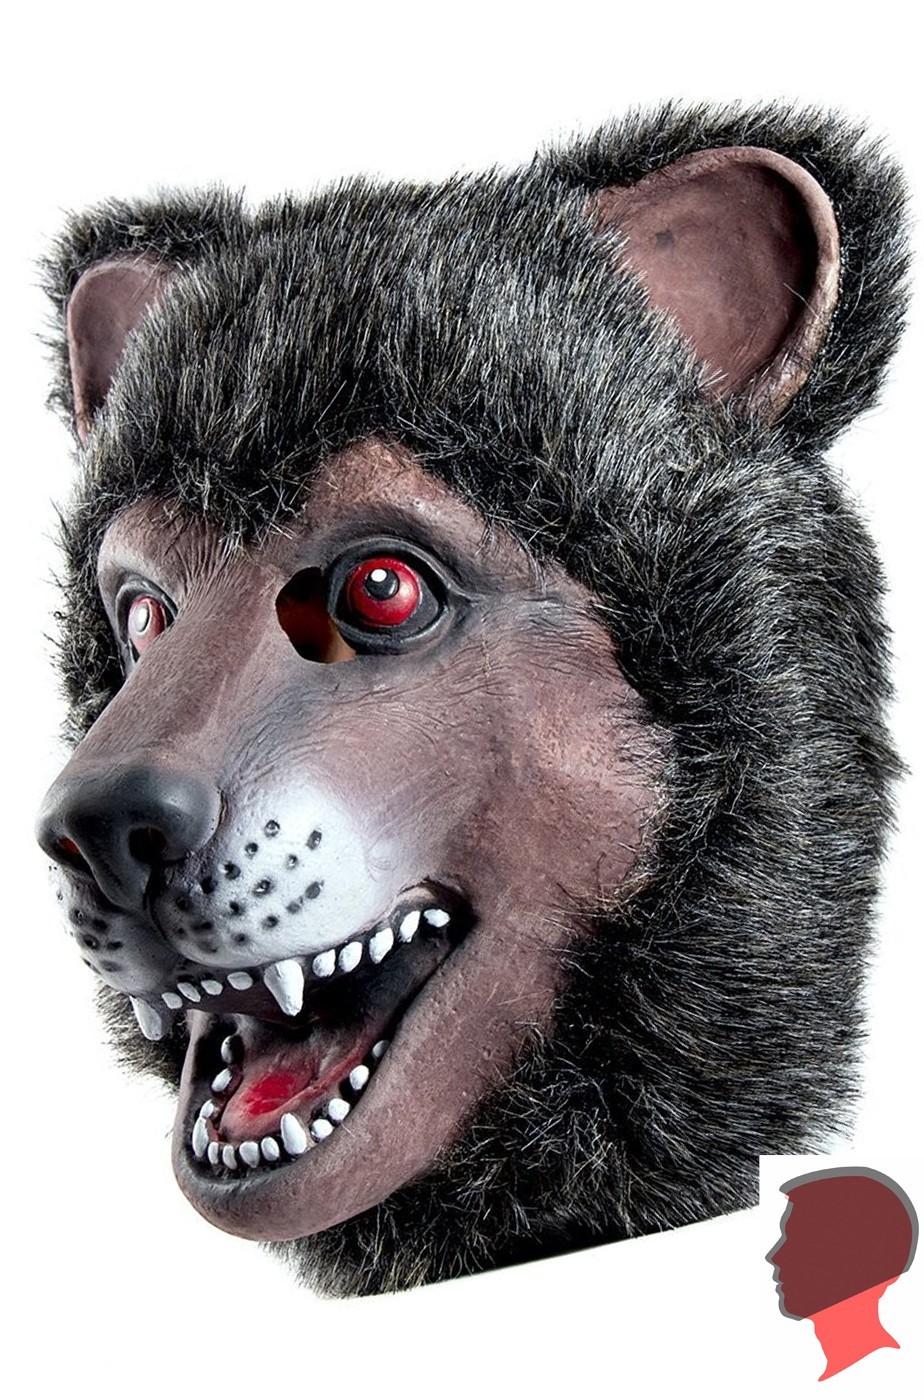 Maschera da orso bruno testa intera in lattice